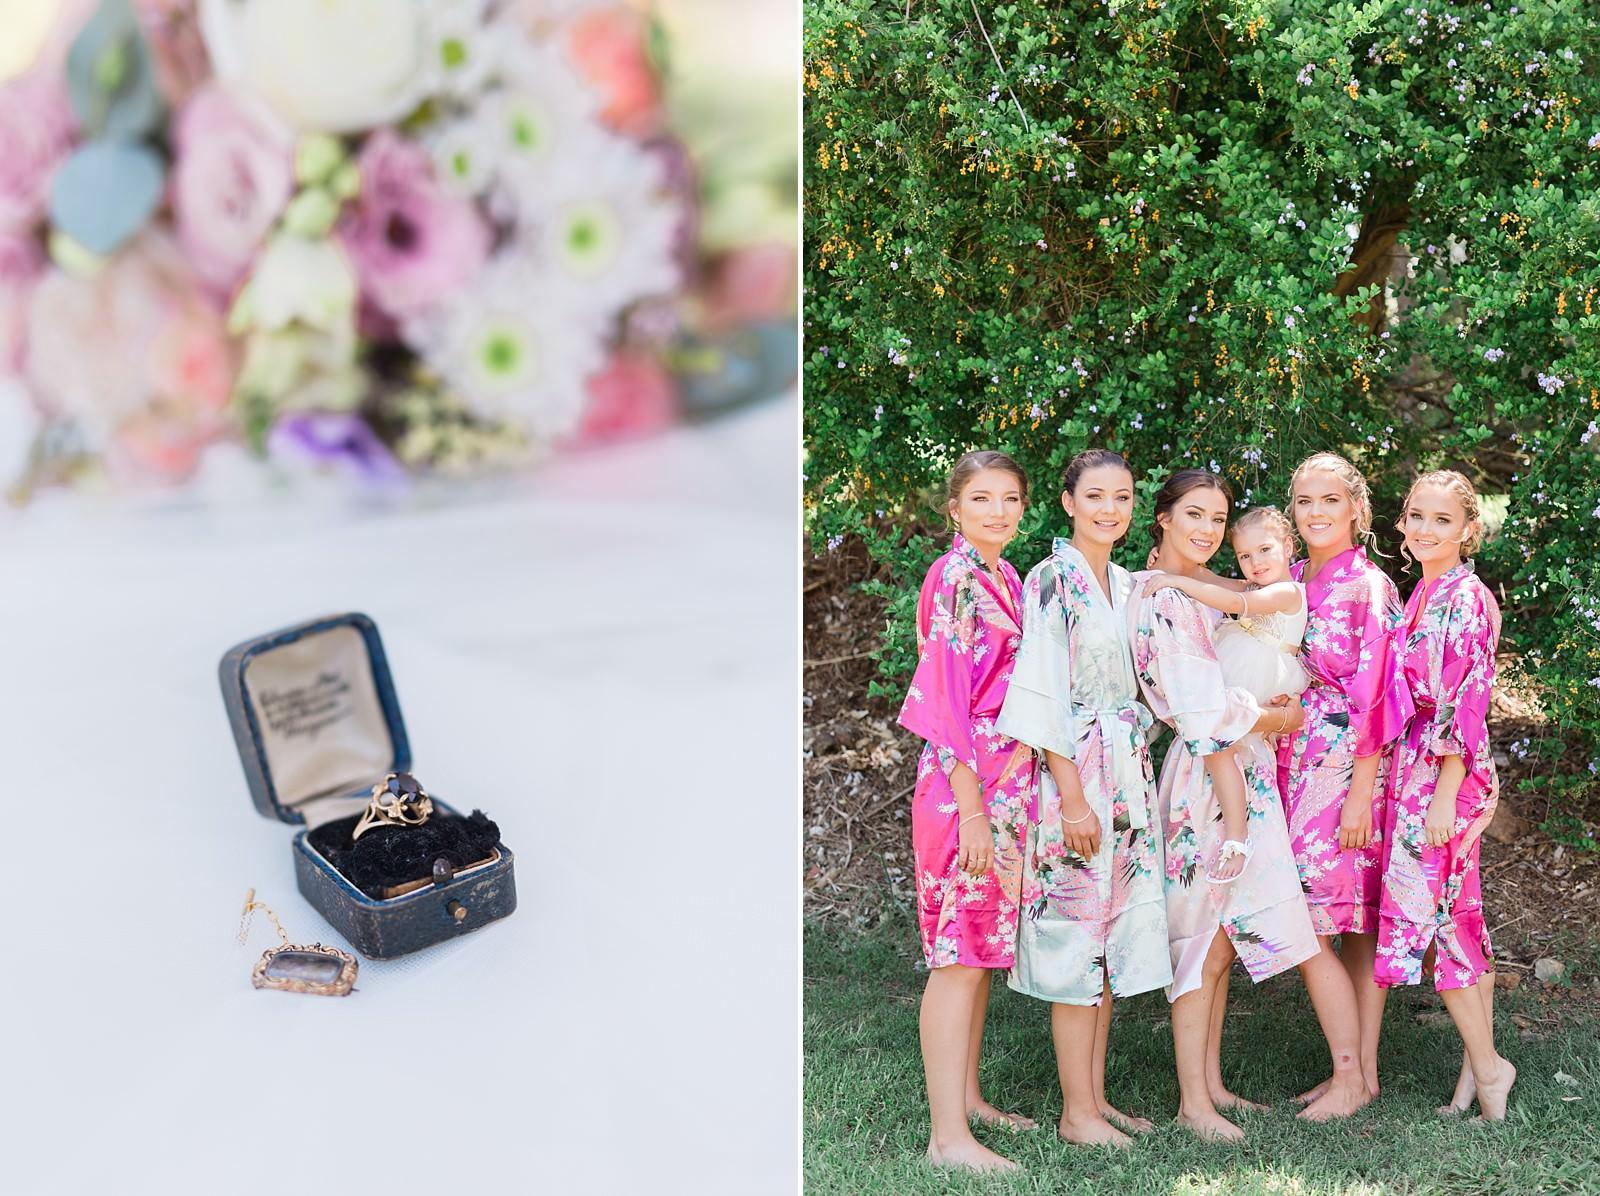 Summergrove Estate Wedding by Mario Colli Photography